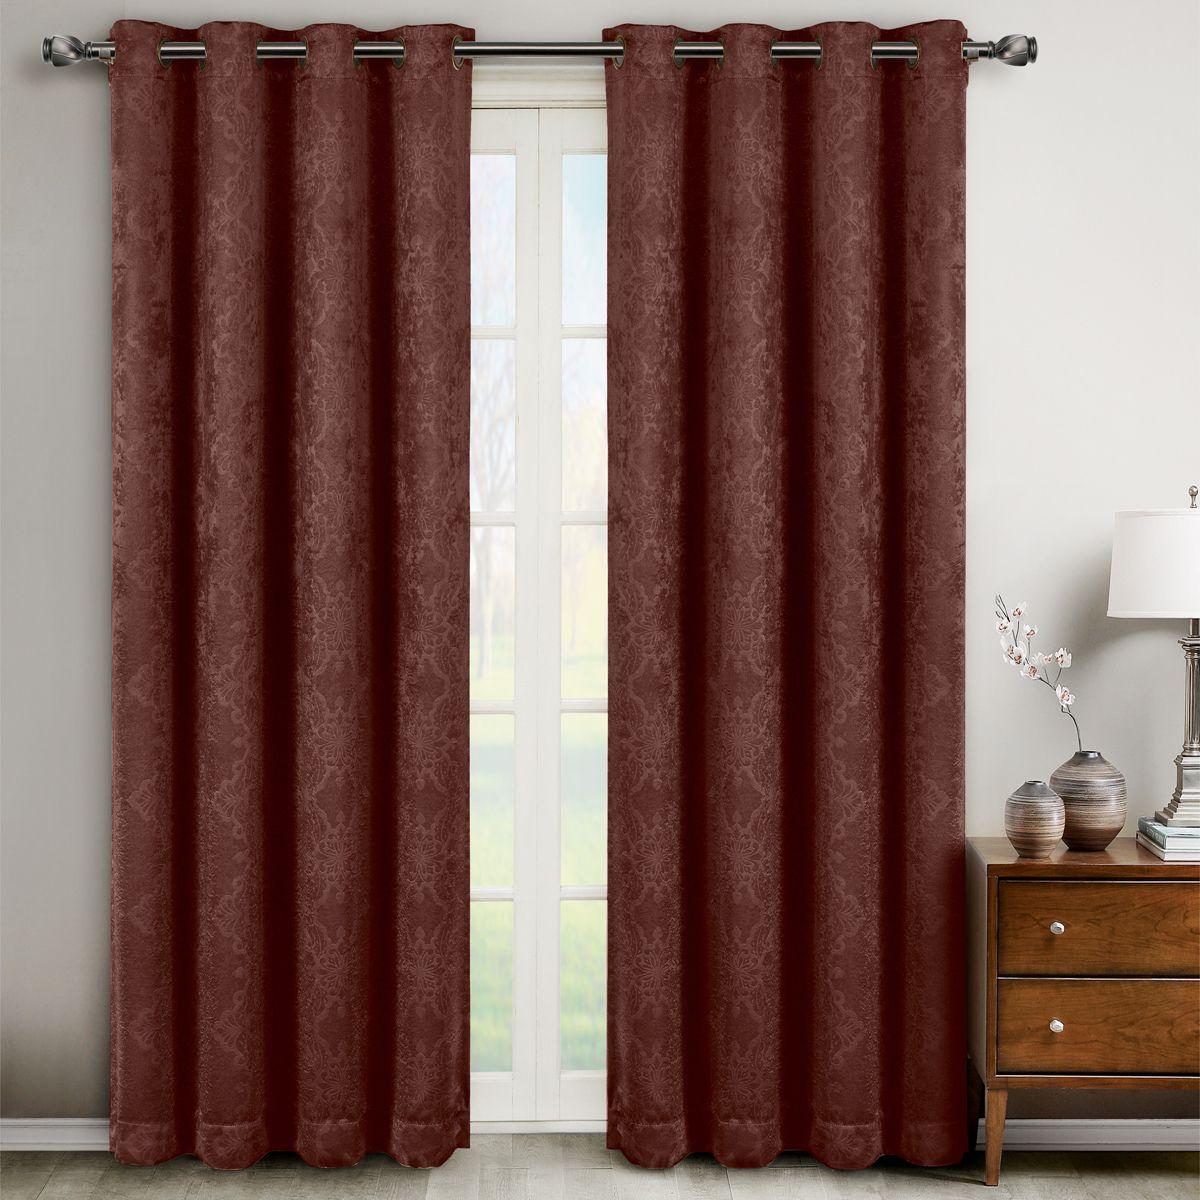 Bella Burgundy Grommet Blackout Weave Embossed Window Curtain Panels Pair Set Of 2 Inches Each By Royal Hotel